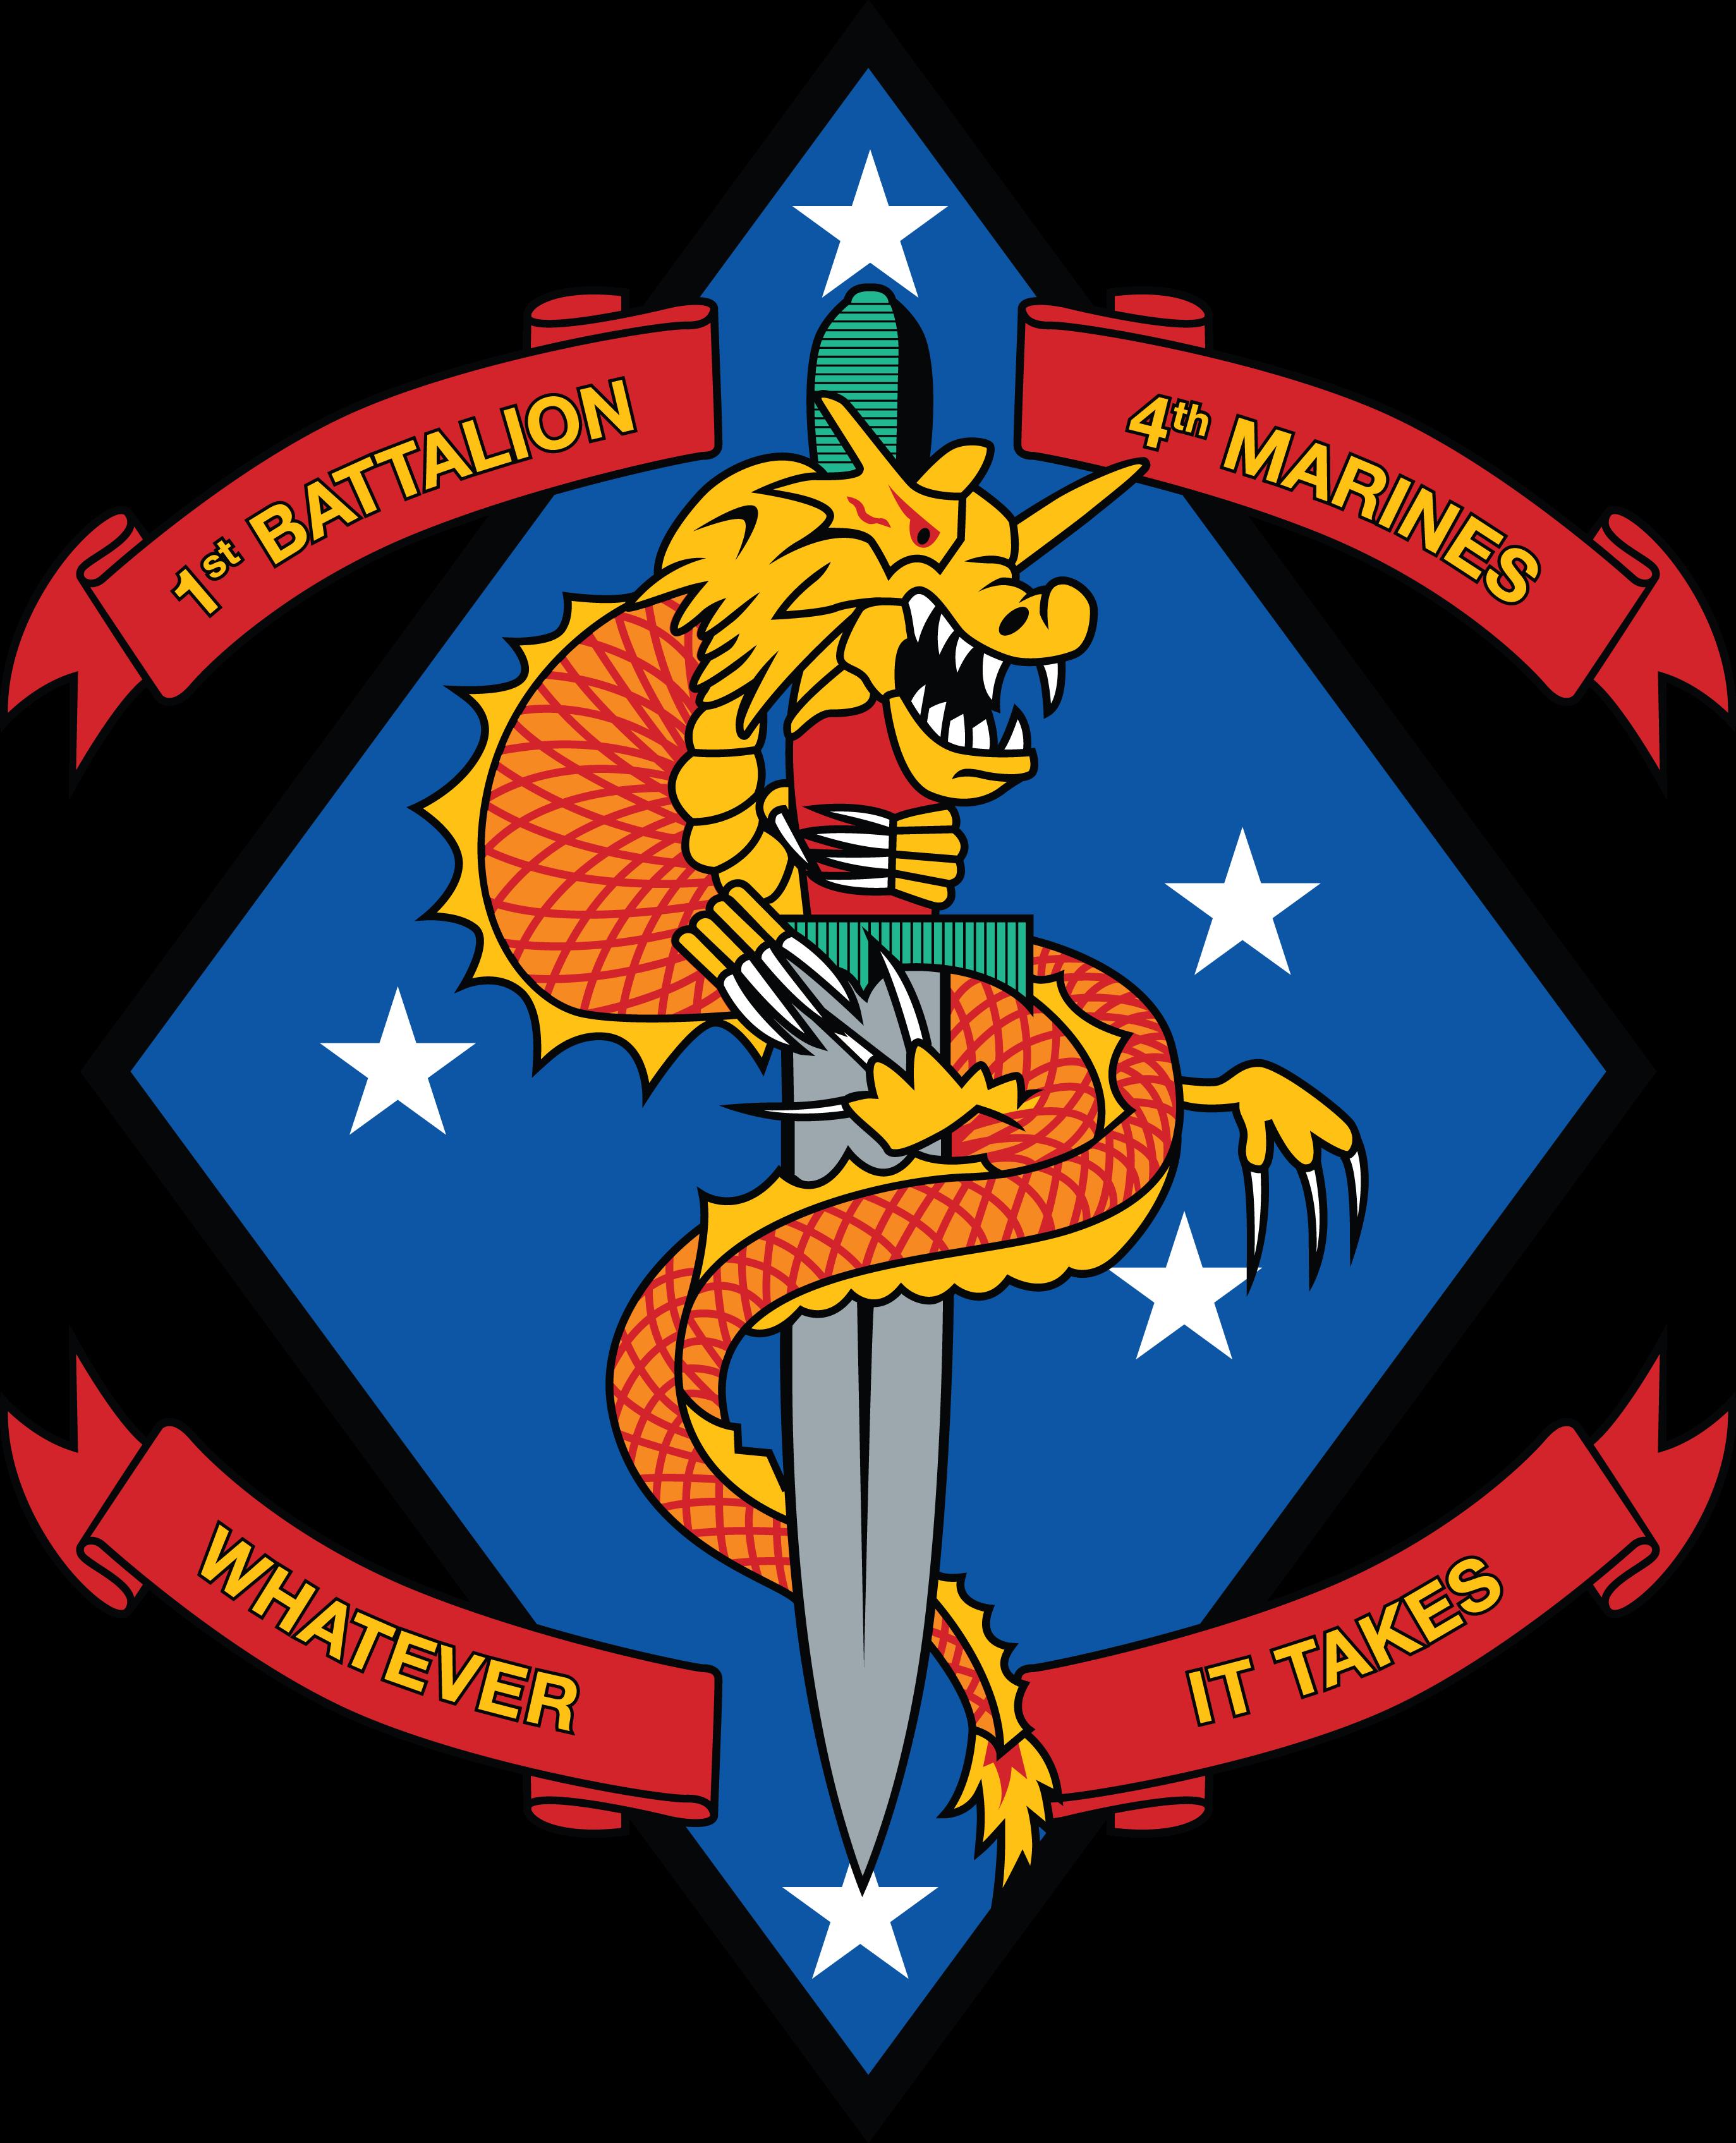 1st Battalion 4th Marine Regiment Of United States Mariners Corps